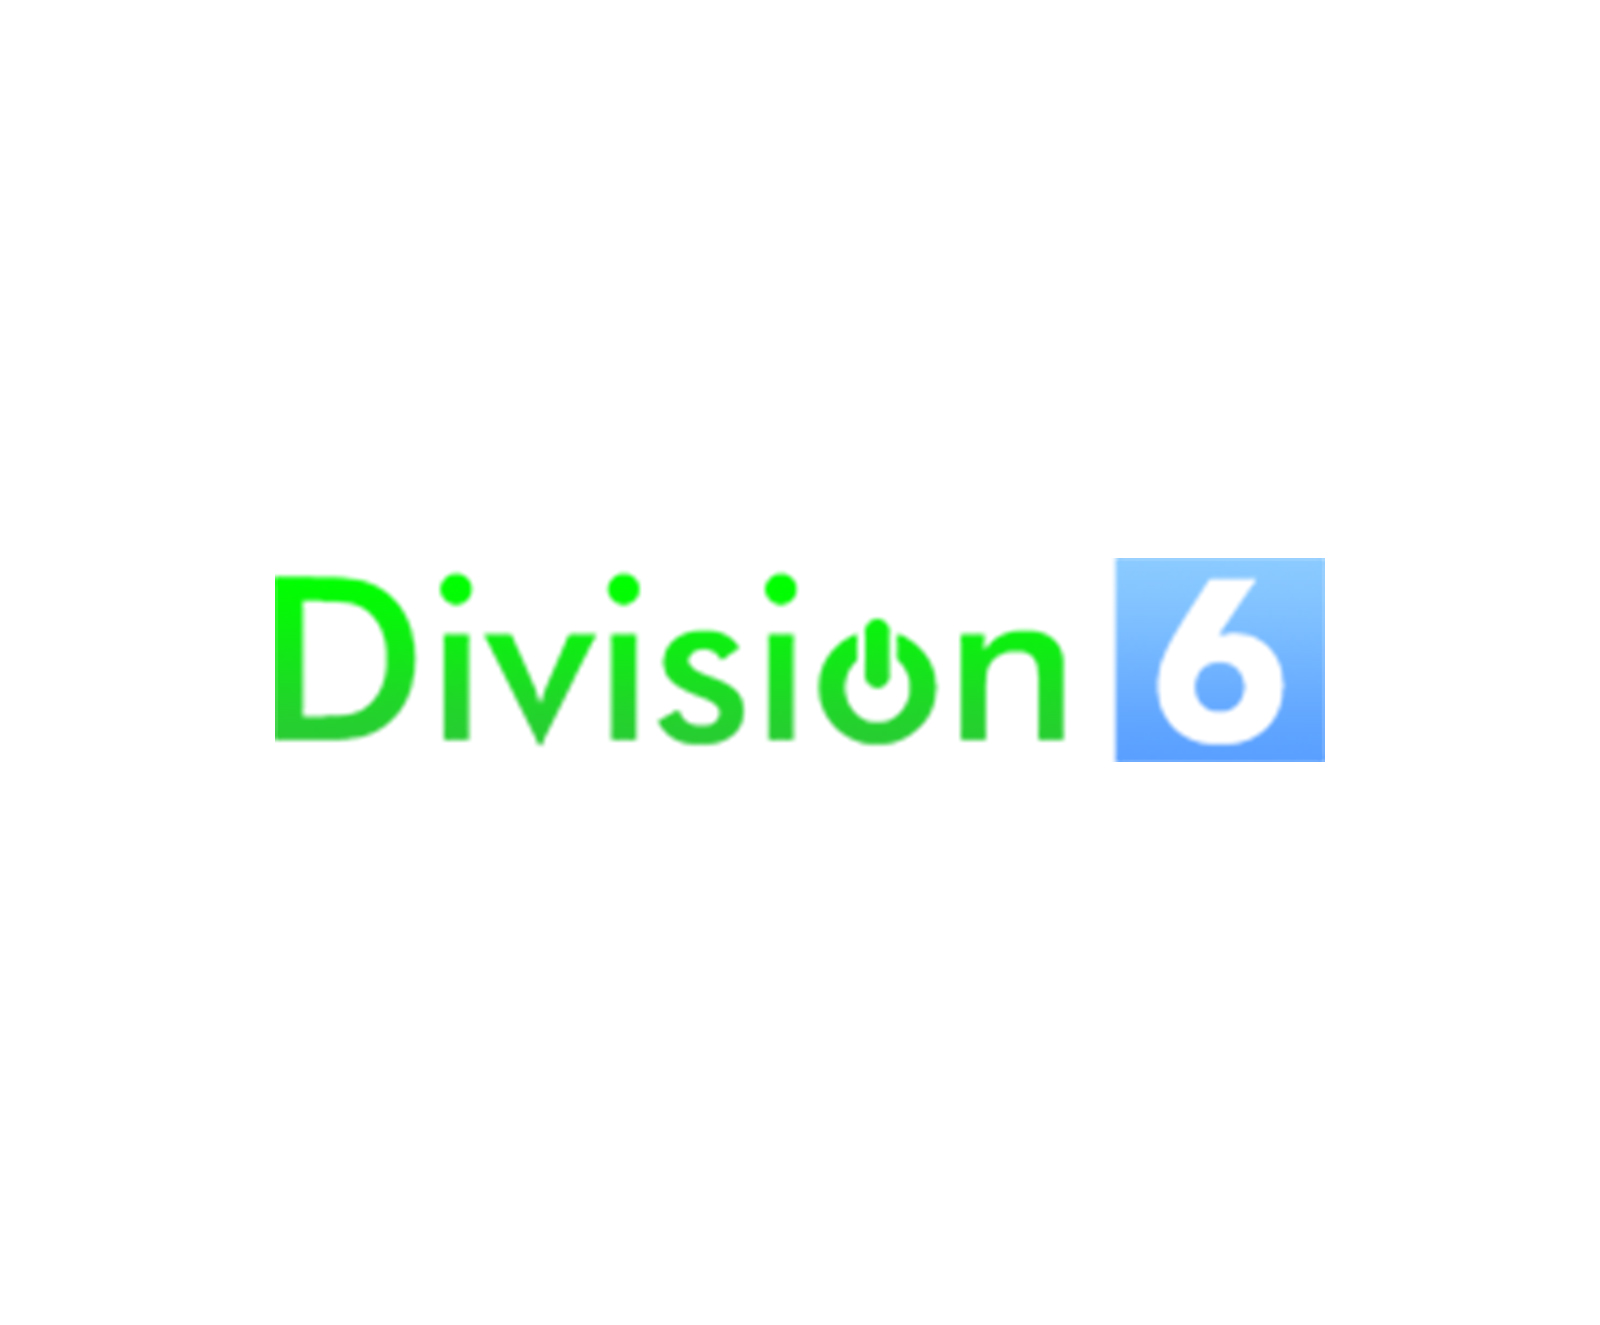 Division 6